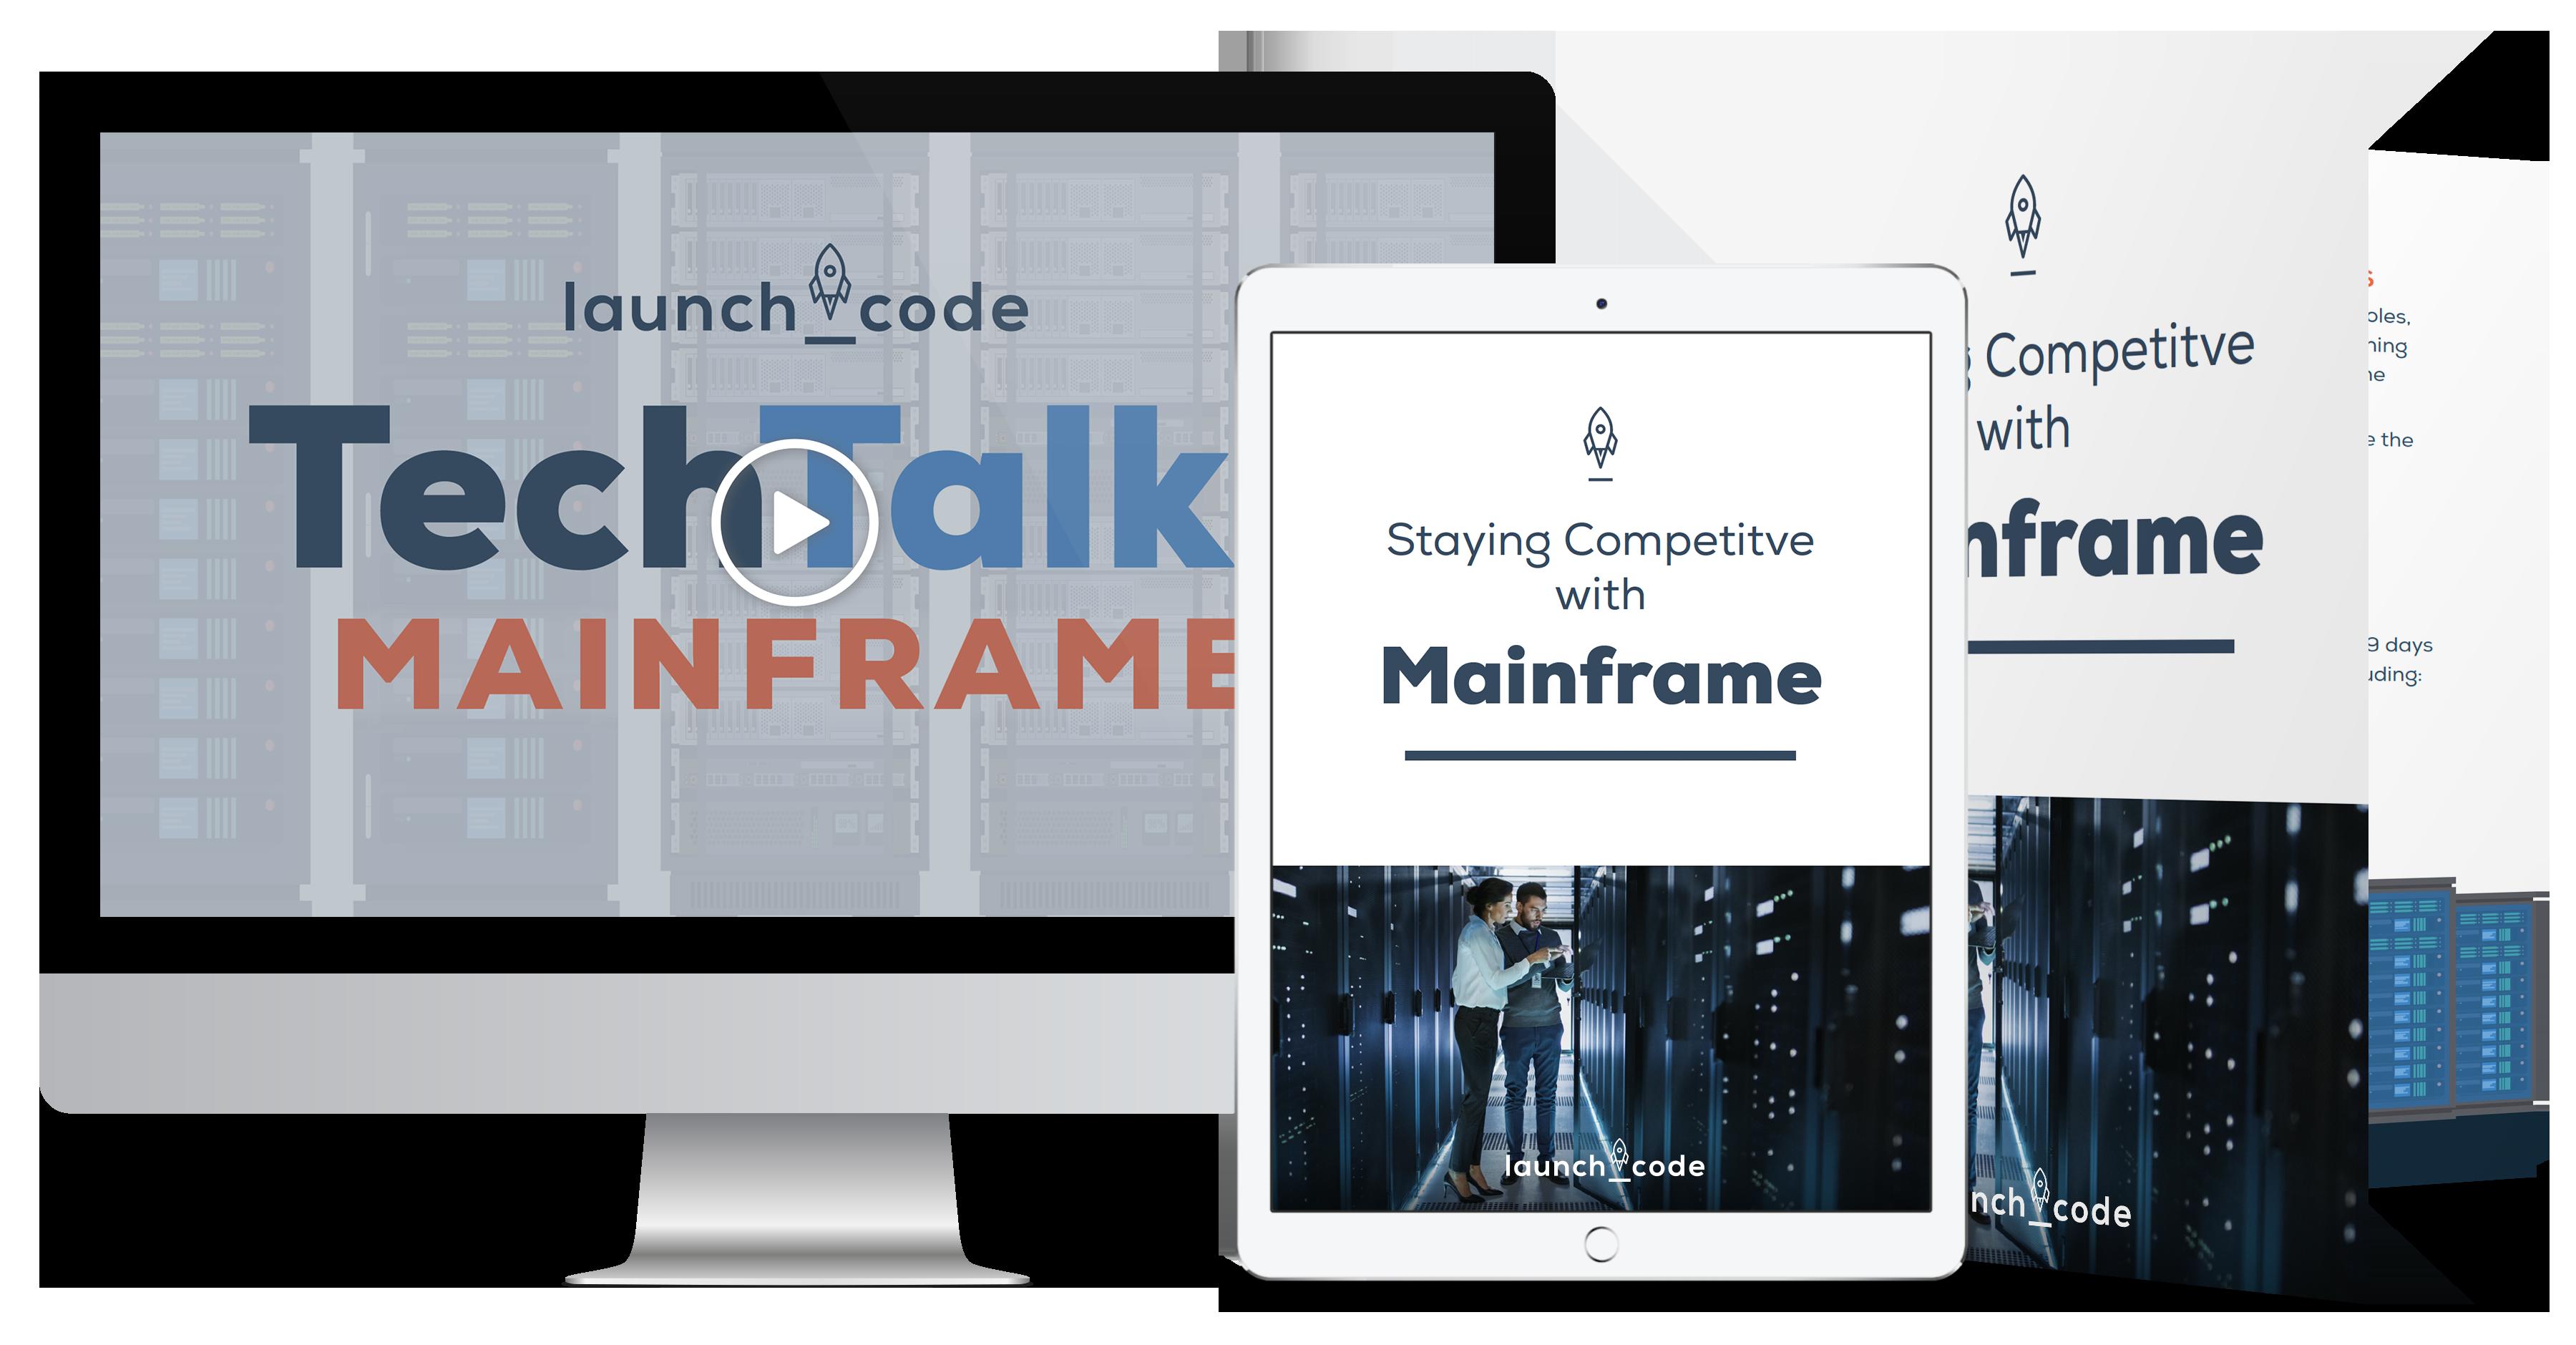 mainframe_ebook-video_mockup